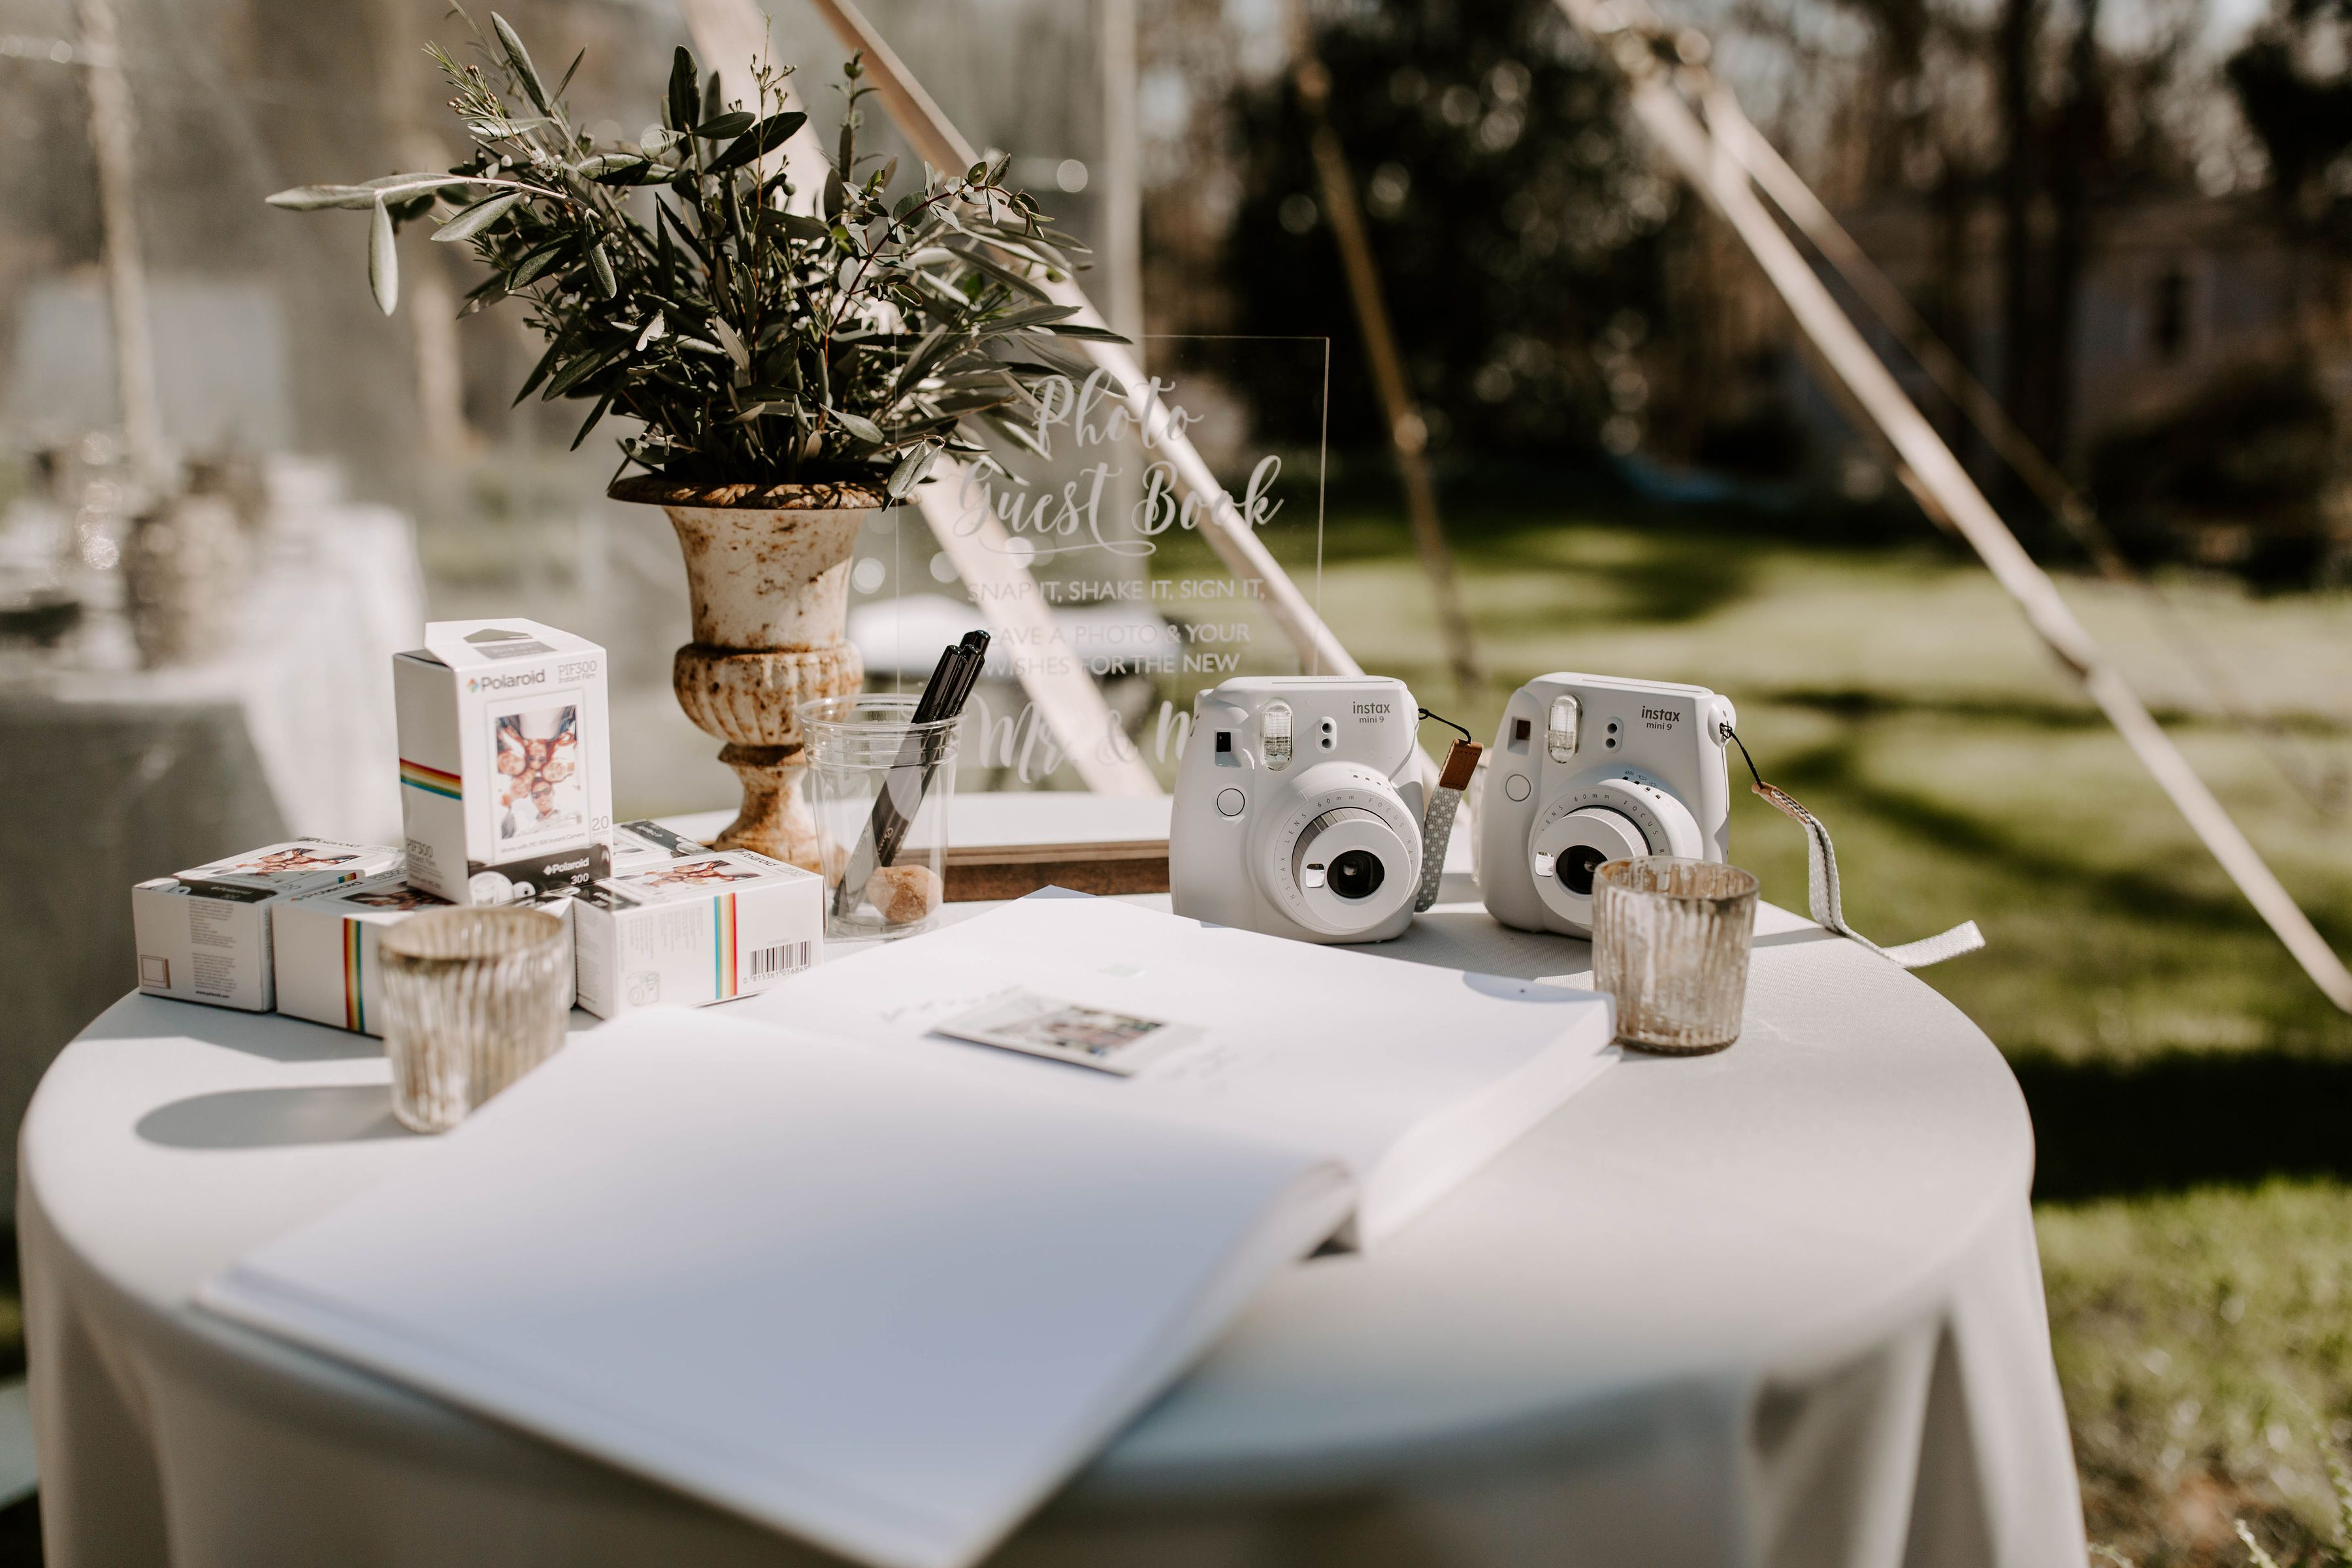 Wedding Polaroid Station Table Decorations Decor Wedding